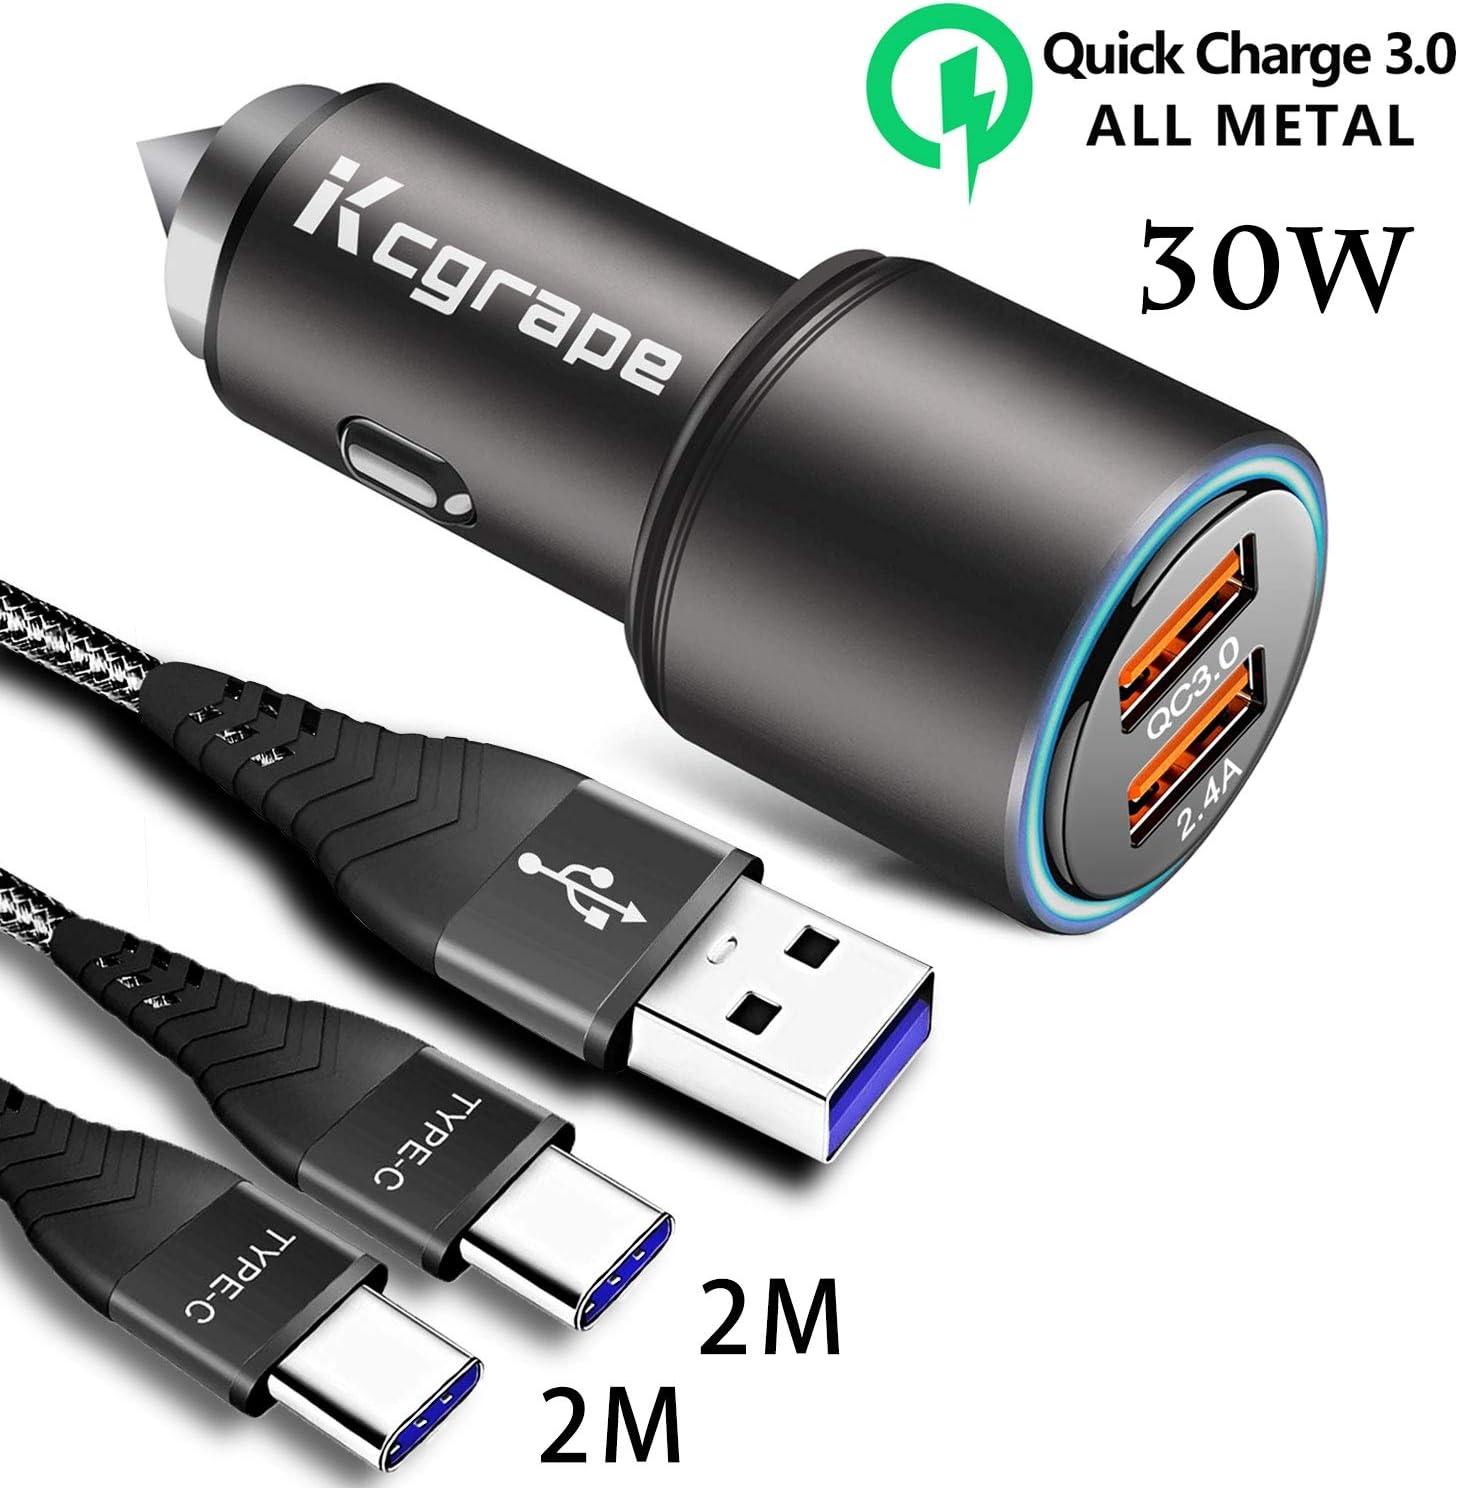 Cargador Móvil Coche Quick Charge 3.0 Con 2M+2M Cable USB Tipo C para Samsung A41 A31 A30S A40 A50 A70 M51 M11,Xiaomi Redmi 8A Note 9 Pro 8T,MI 10T Lite,Poco F2 Pro/X3,LG,Oppo A9 2020,30W Carga Rapida